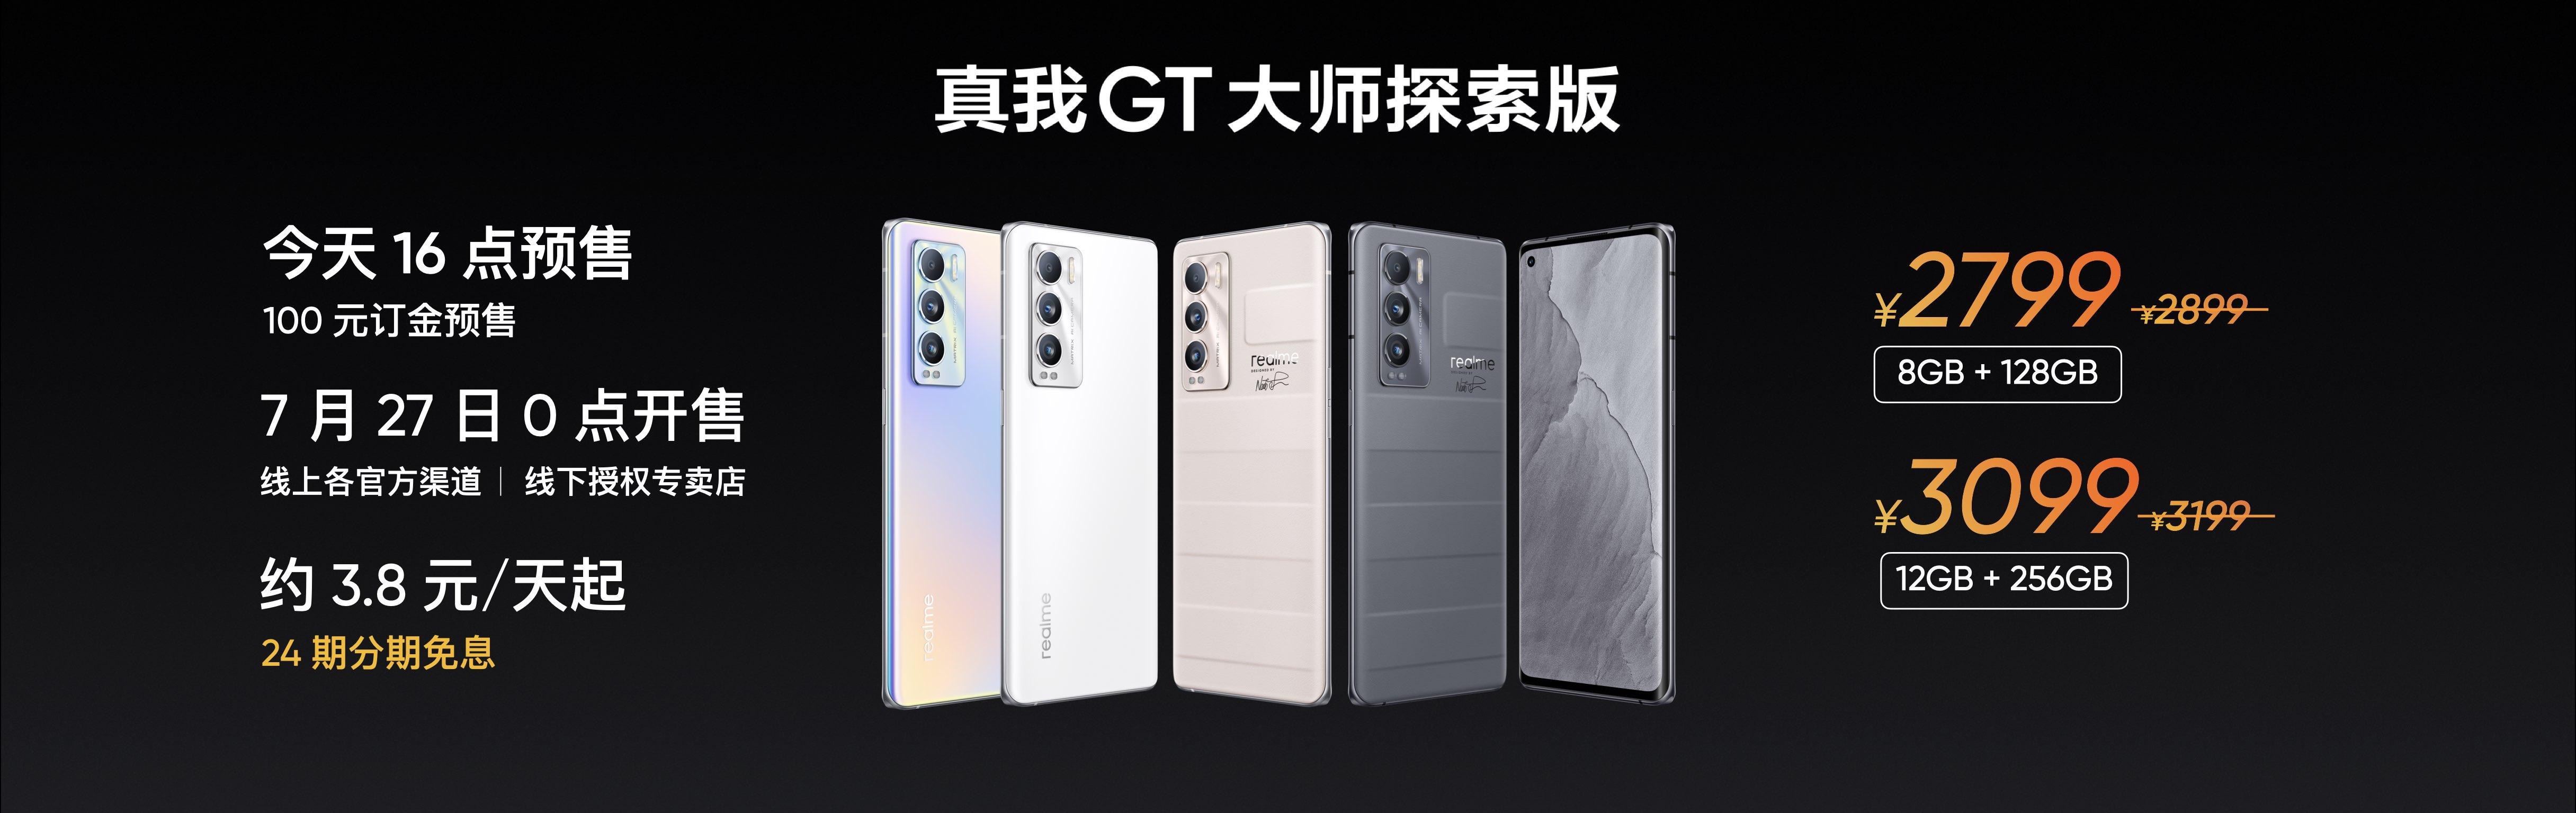 realme GT大师版发布:骁龙778G+顶级设计 2399元起售